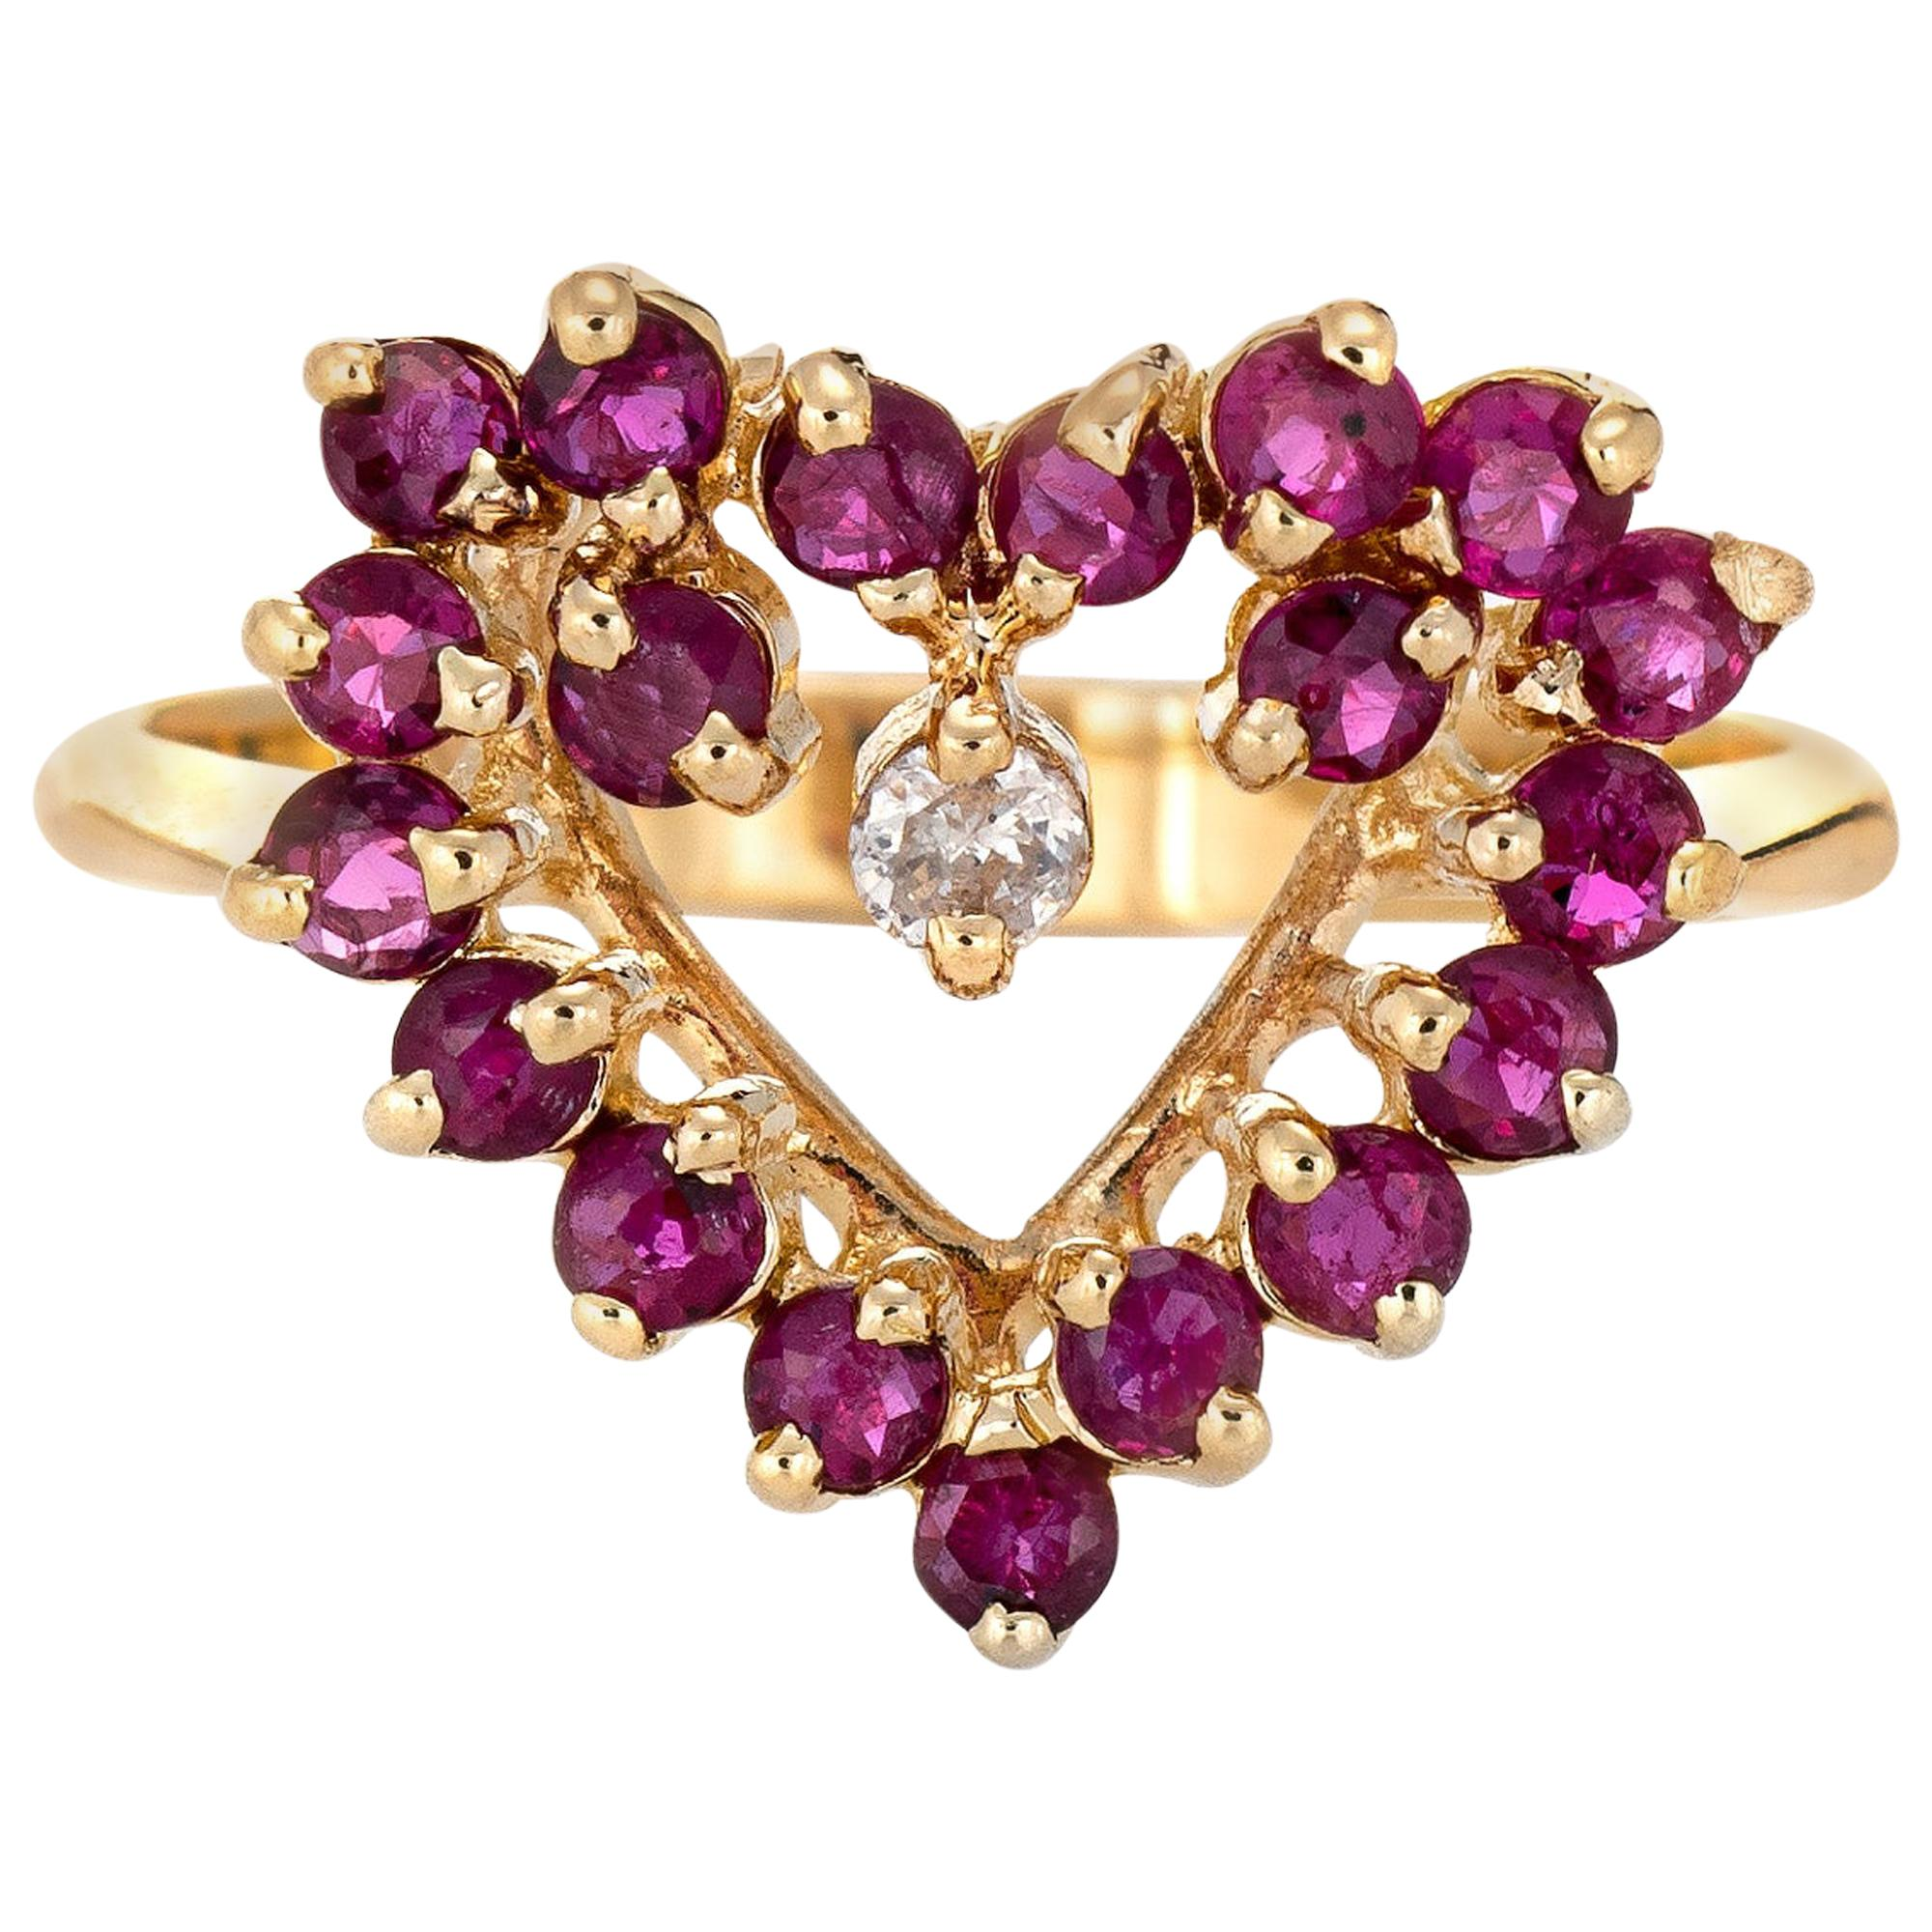 Ruby Diamond Heart Pinky Ring Vintage 14 Karat Yellow Gold Estate Fine Jewelry